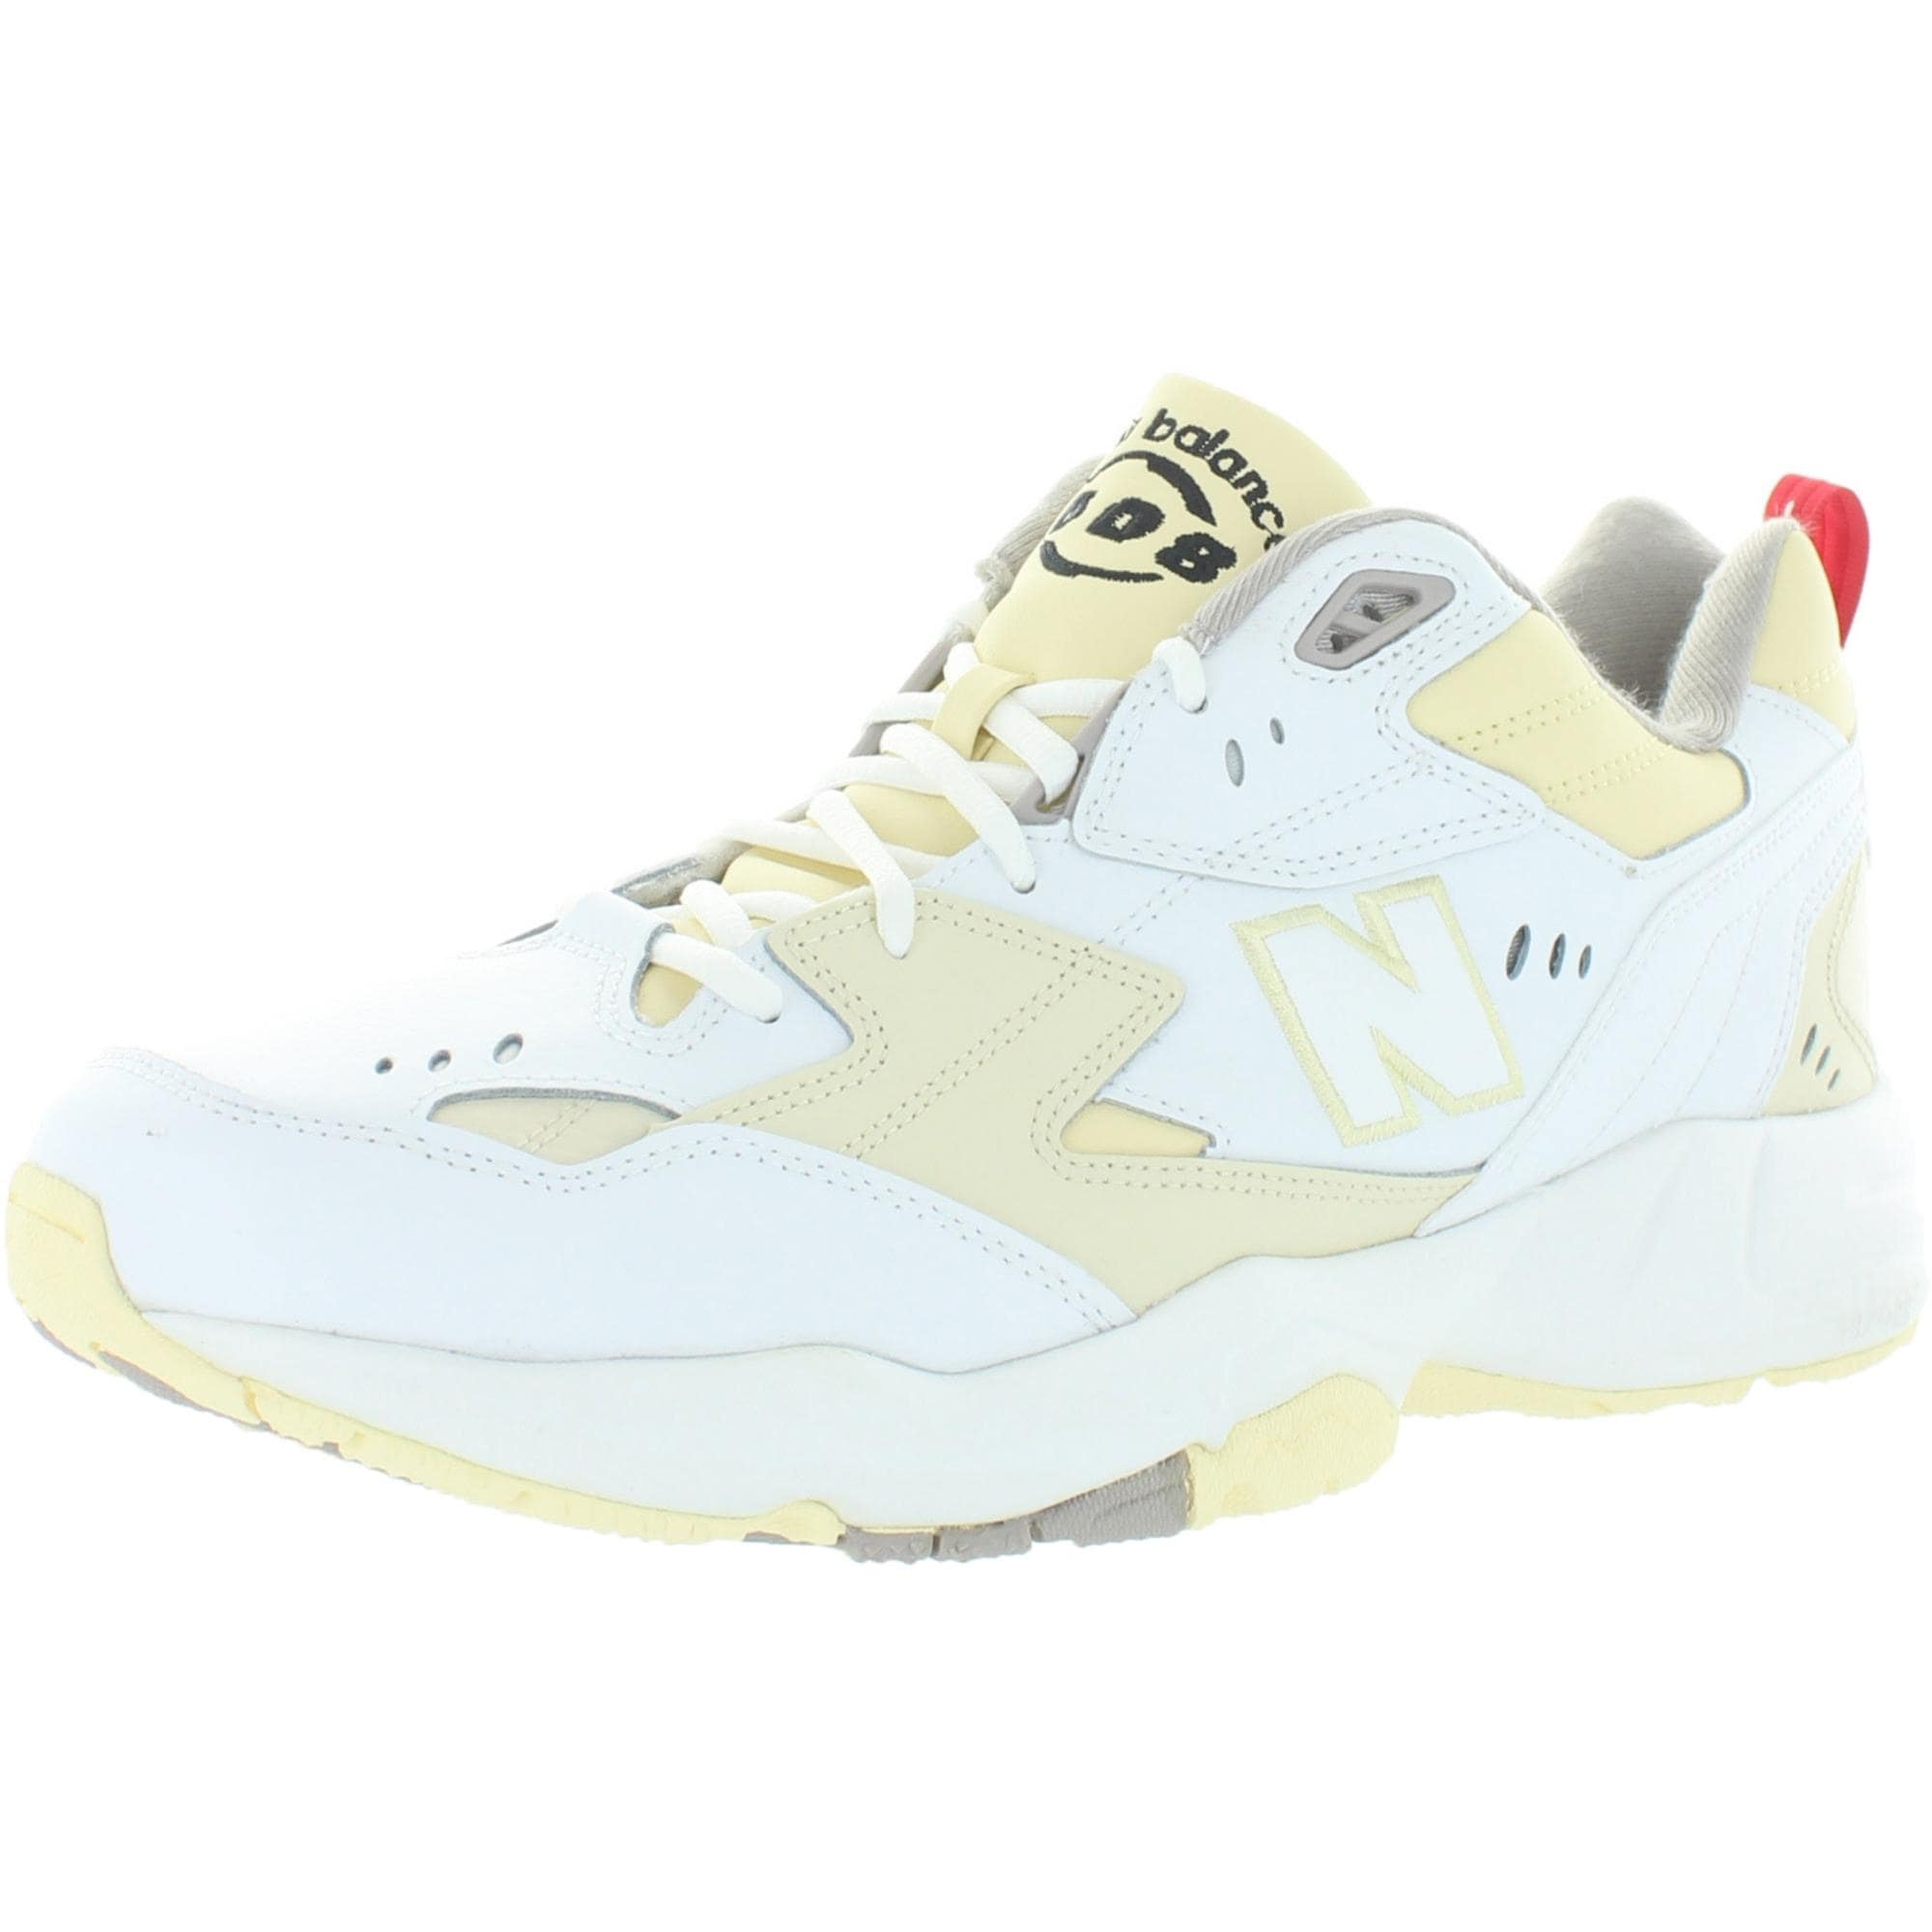 Shop New Balance Mens 608 V1 Sneakers